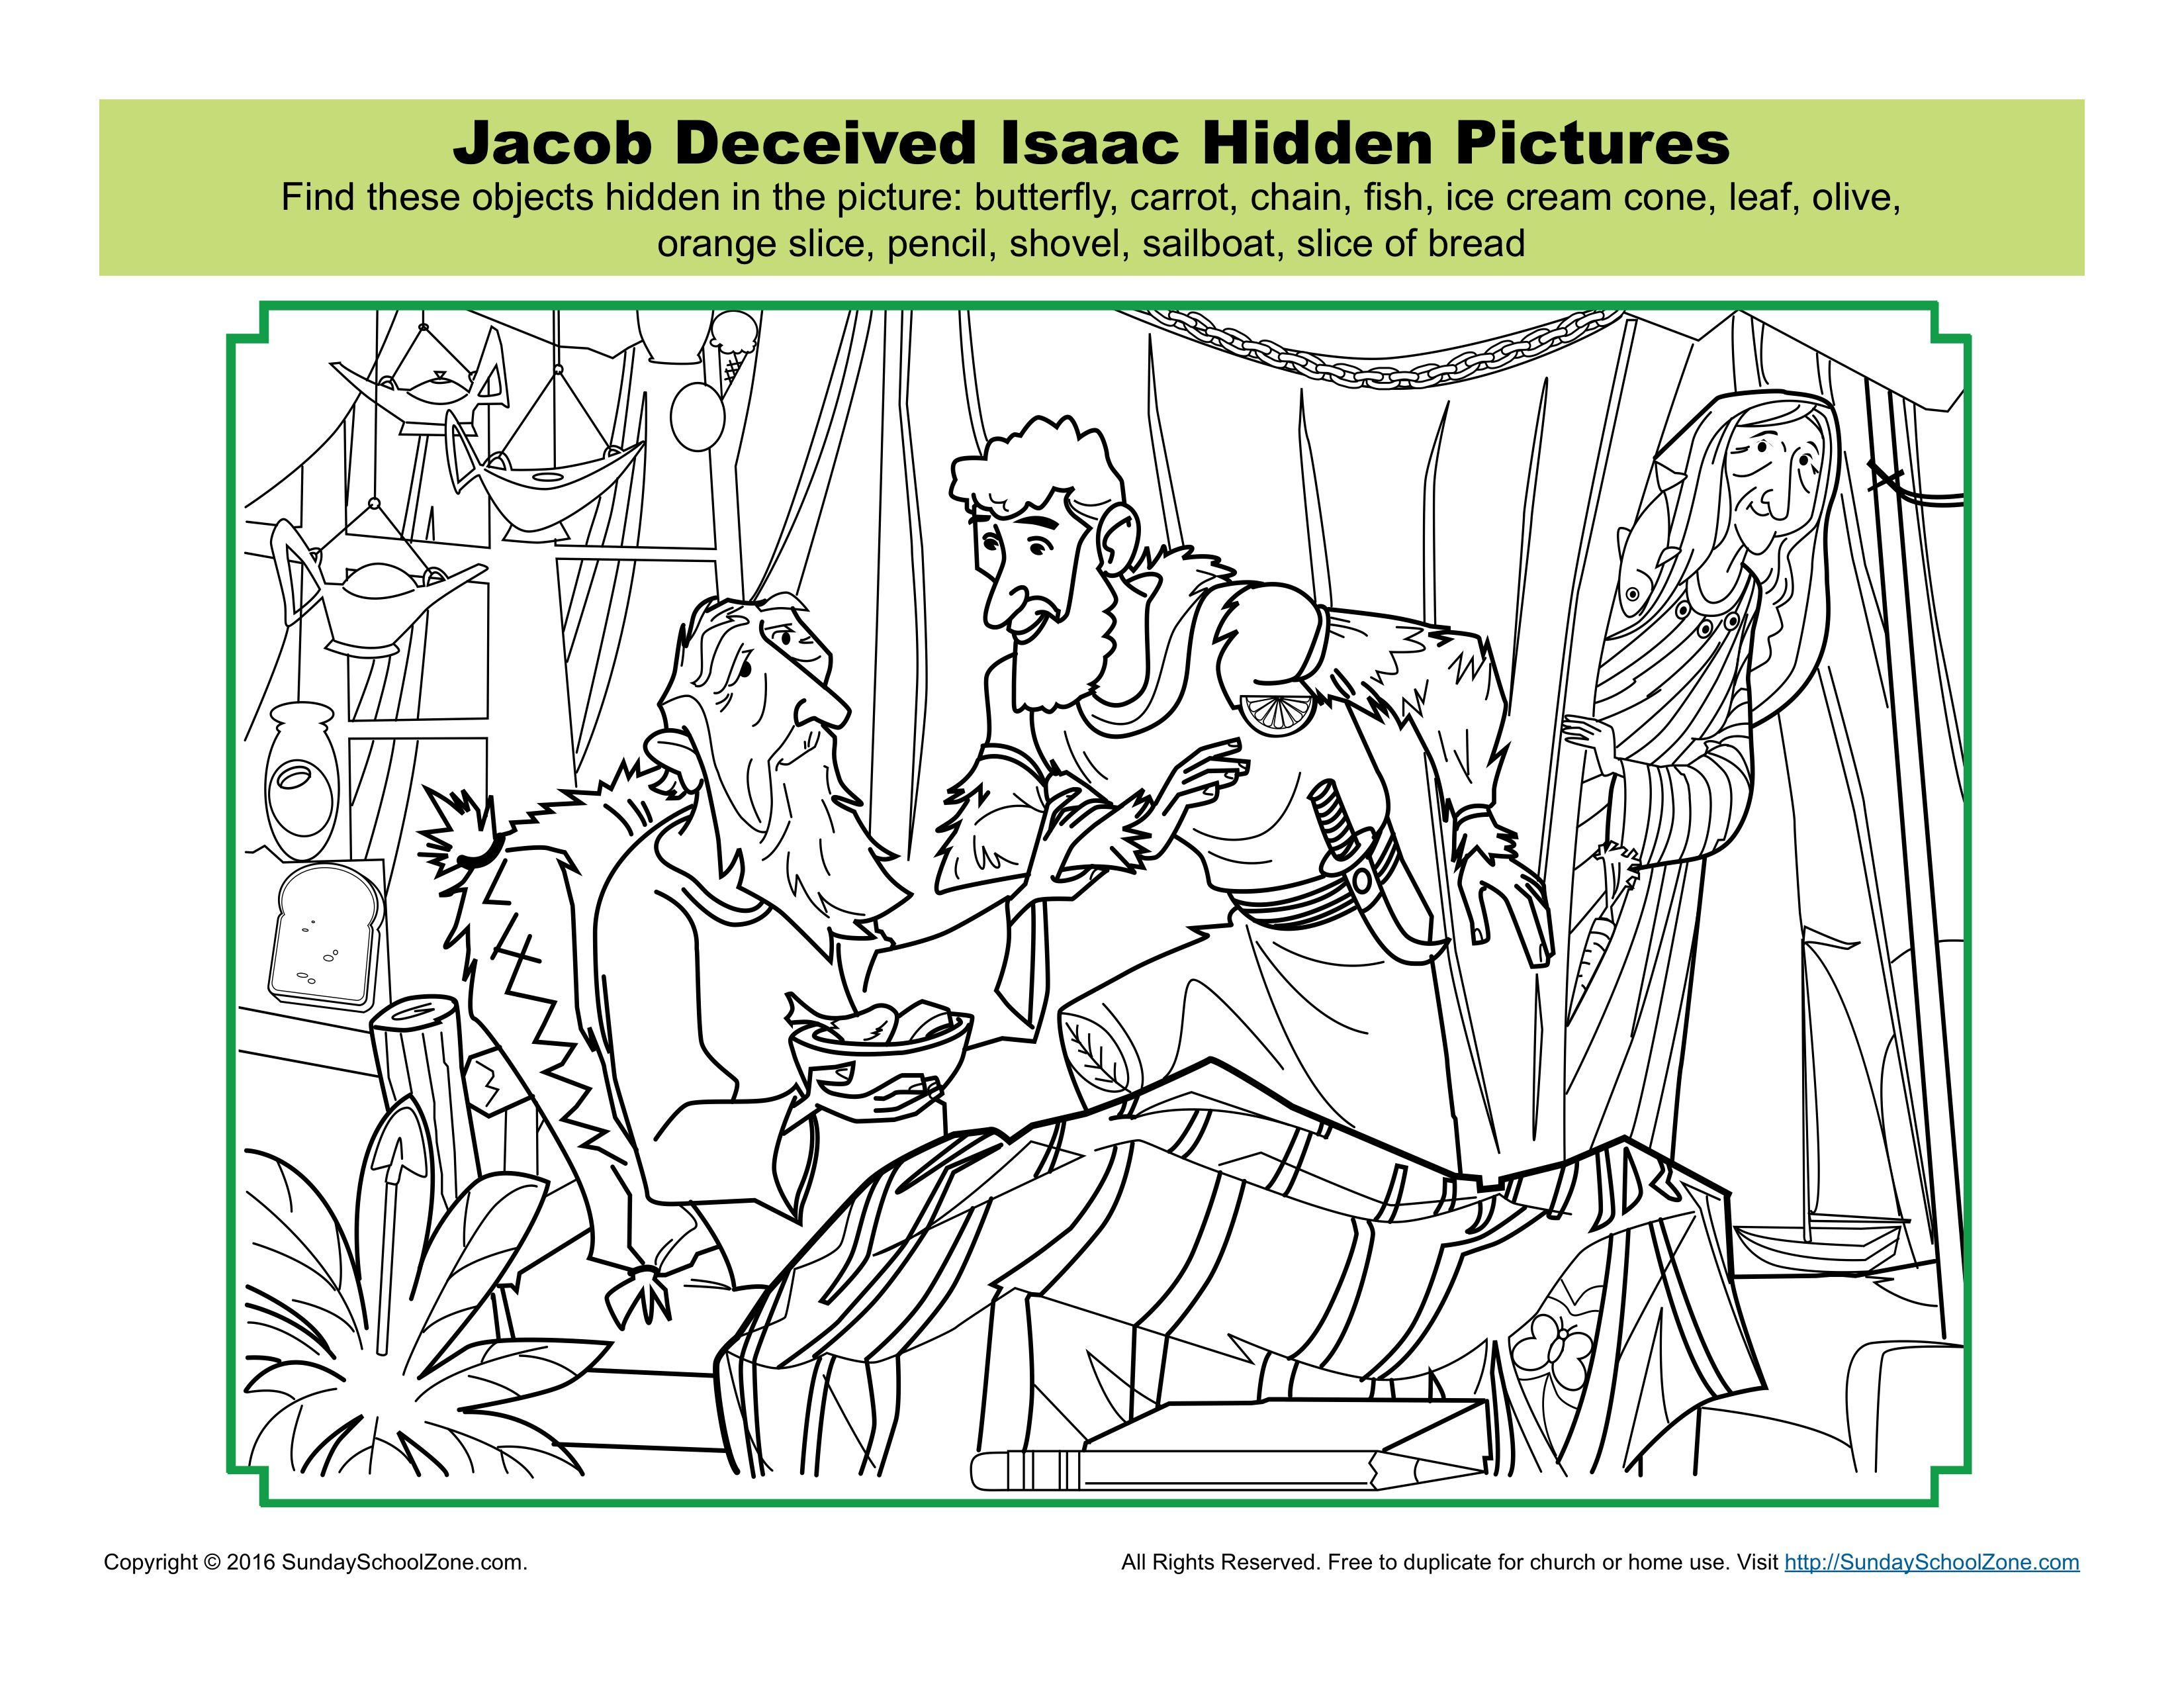 Jacob Deceived Isaac Hidden Pictures Activity